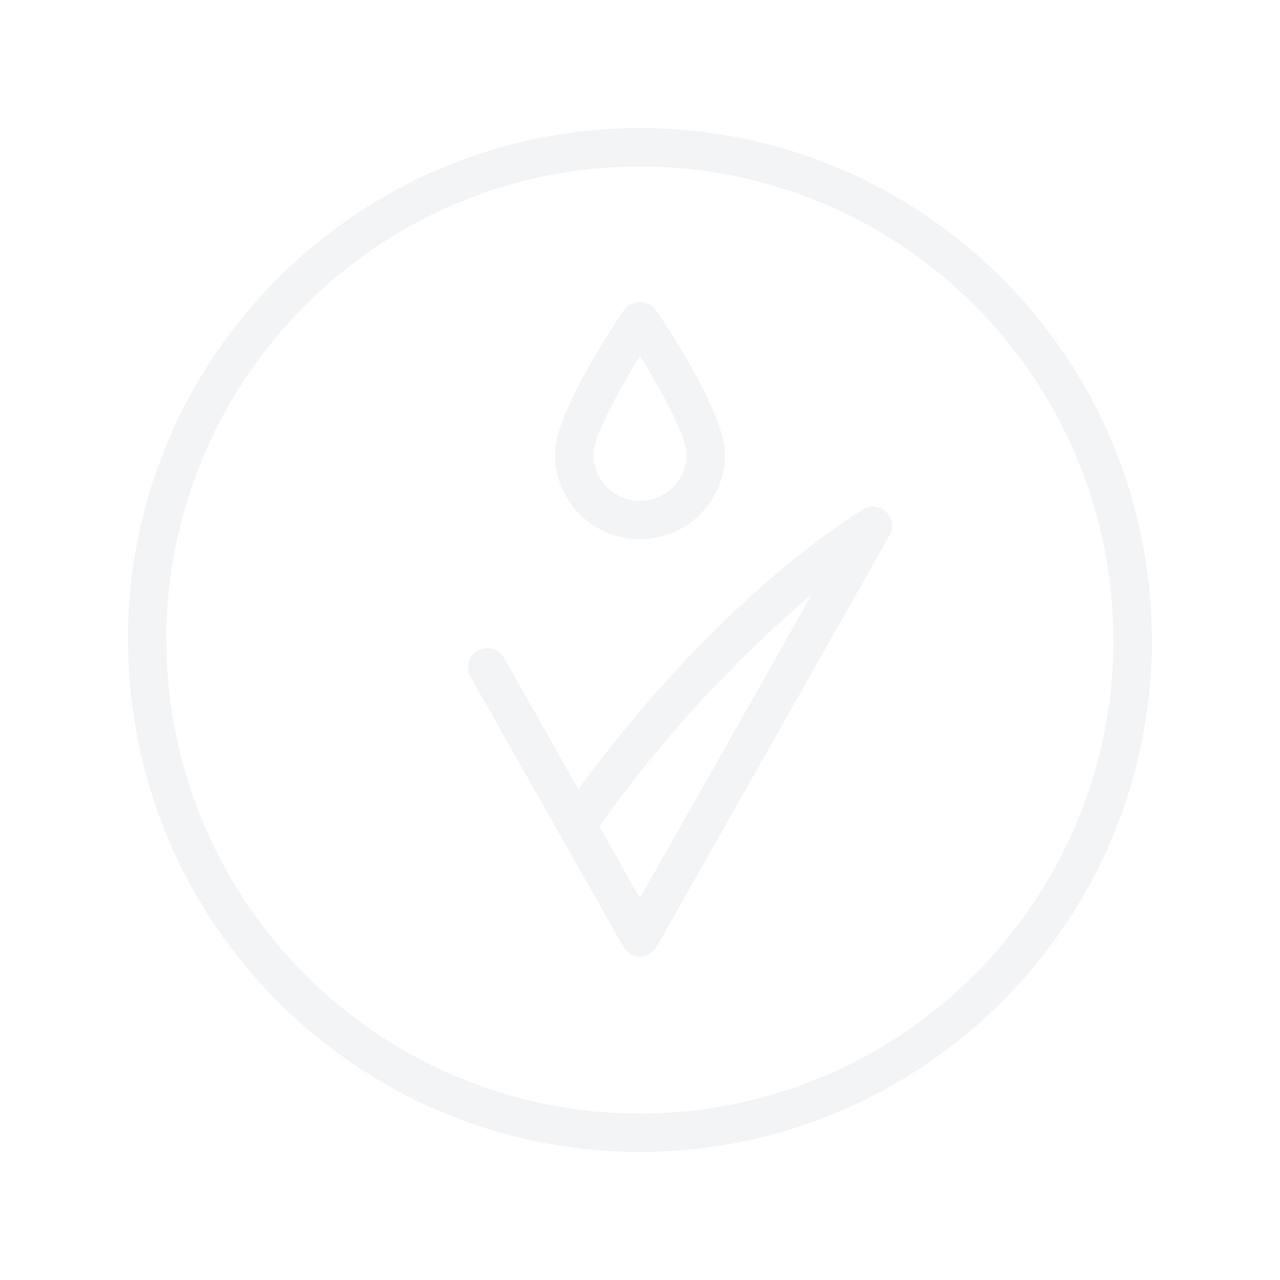 BIOKAP Nutricolor Delicato 1.0 Permanent Hair Dye 140ml